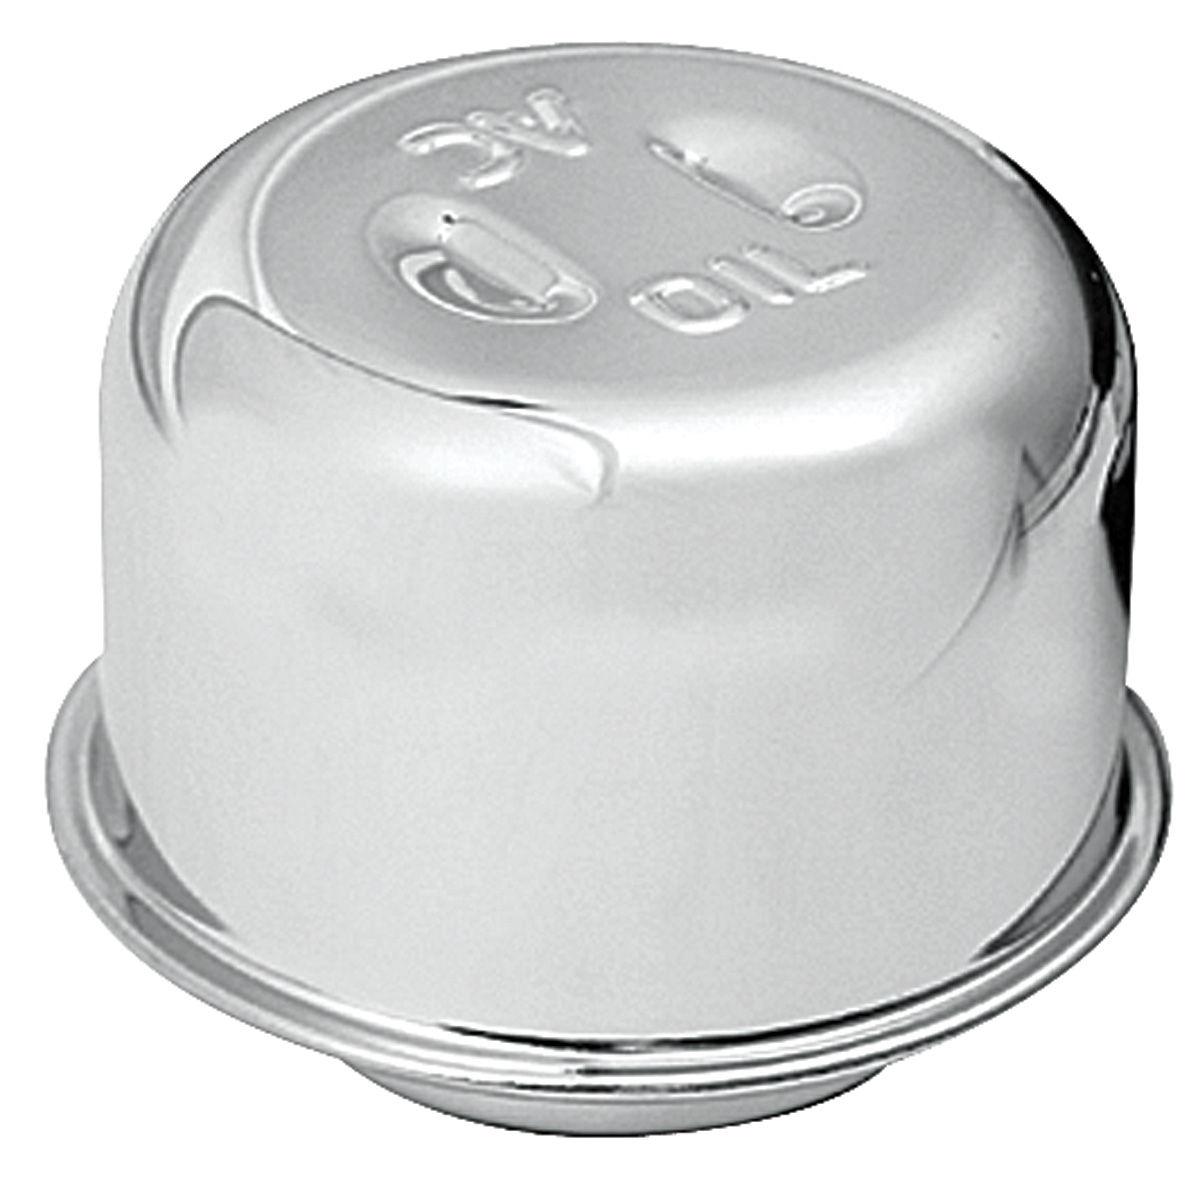 Photo of Oil Filler Cap Chrome twist-on